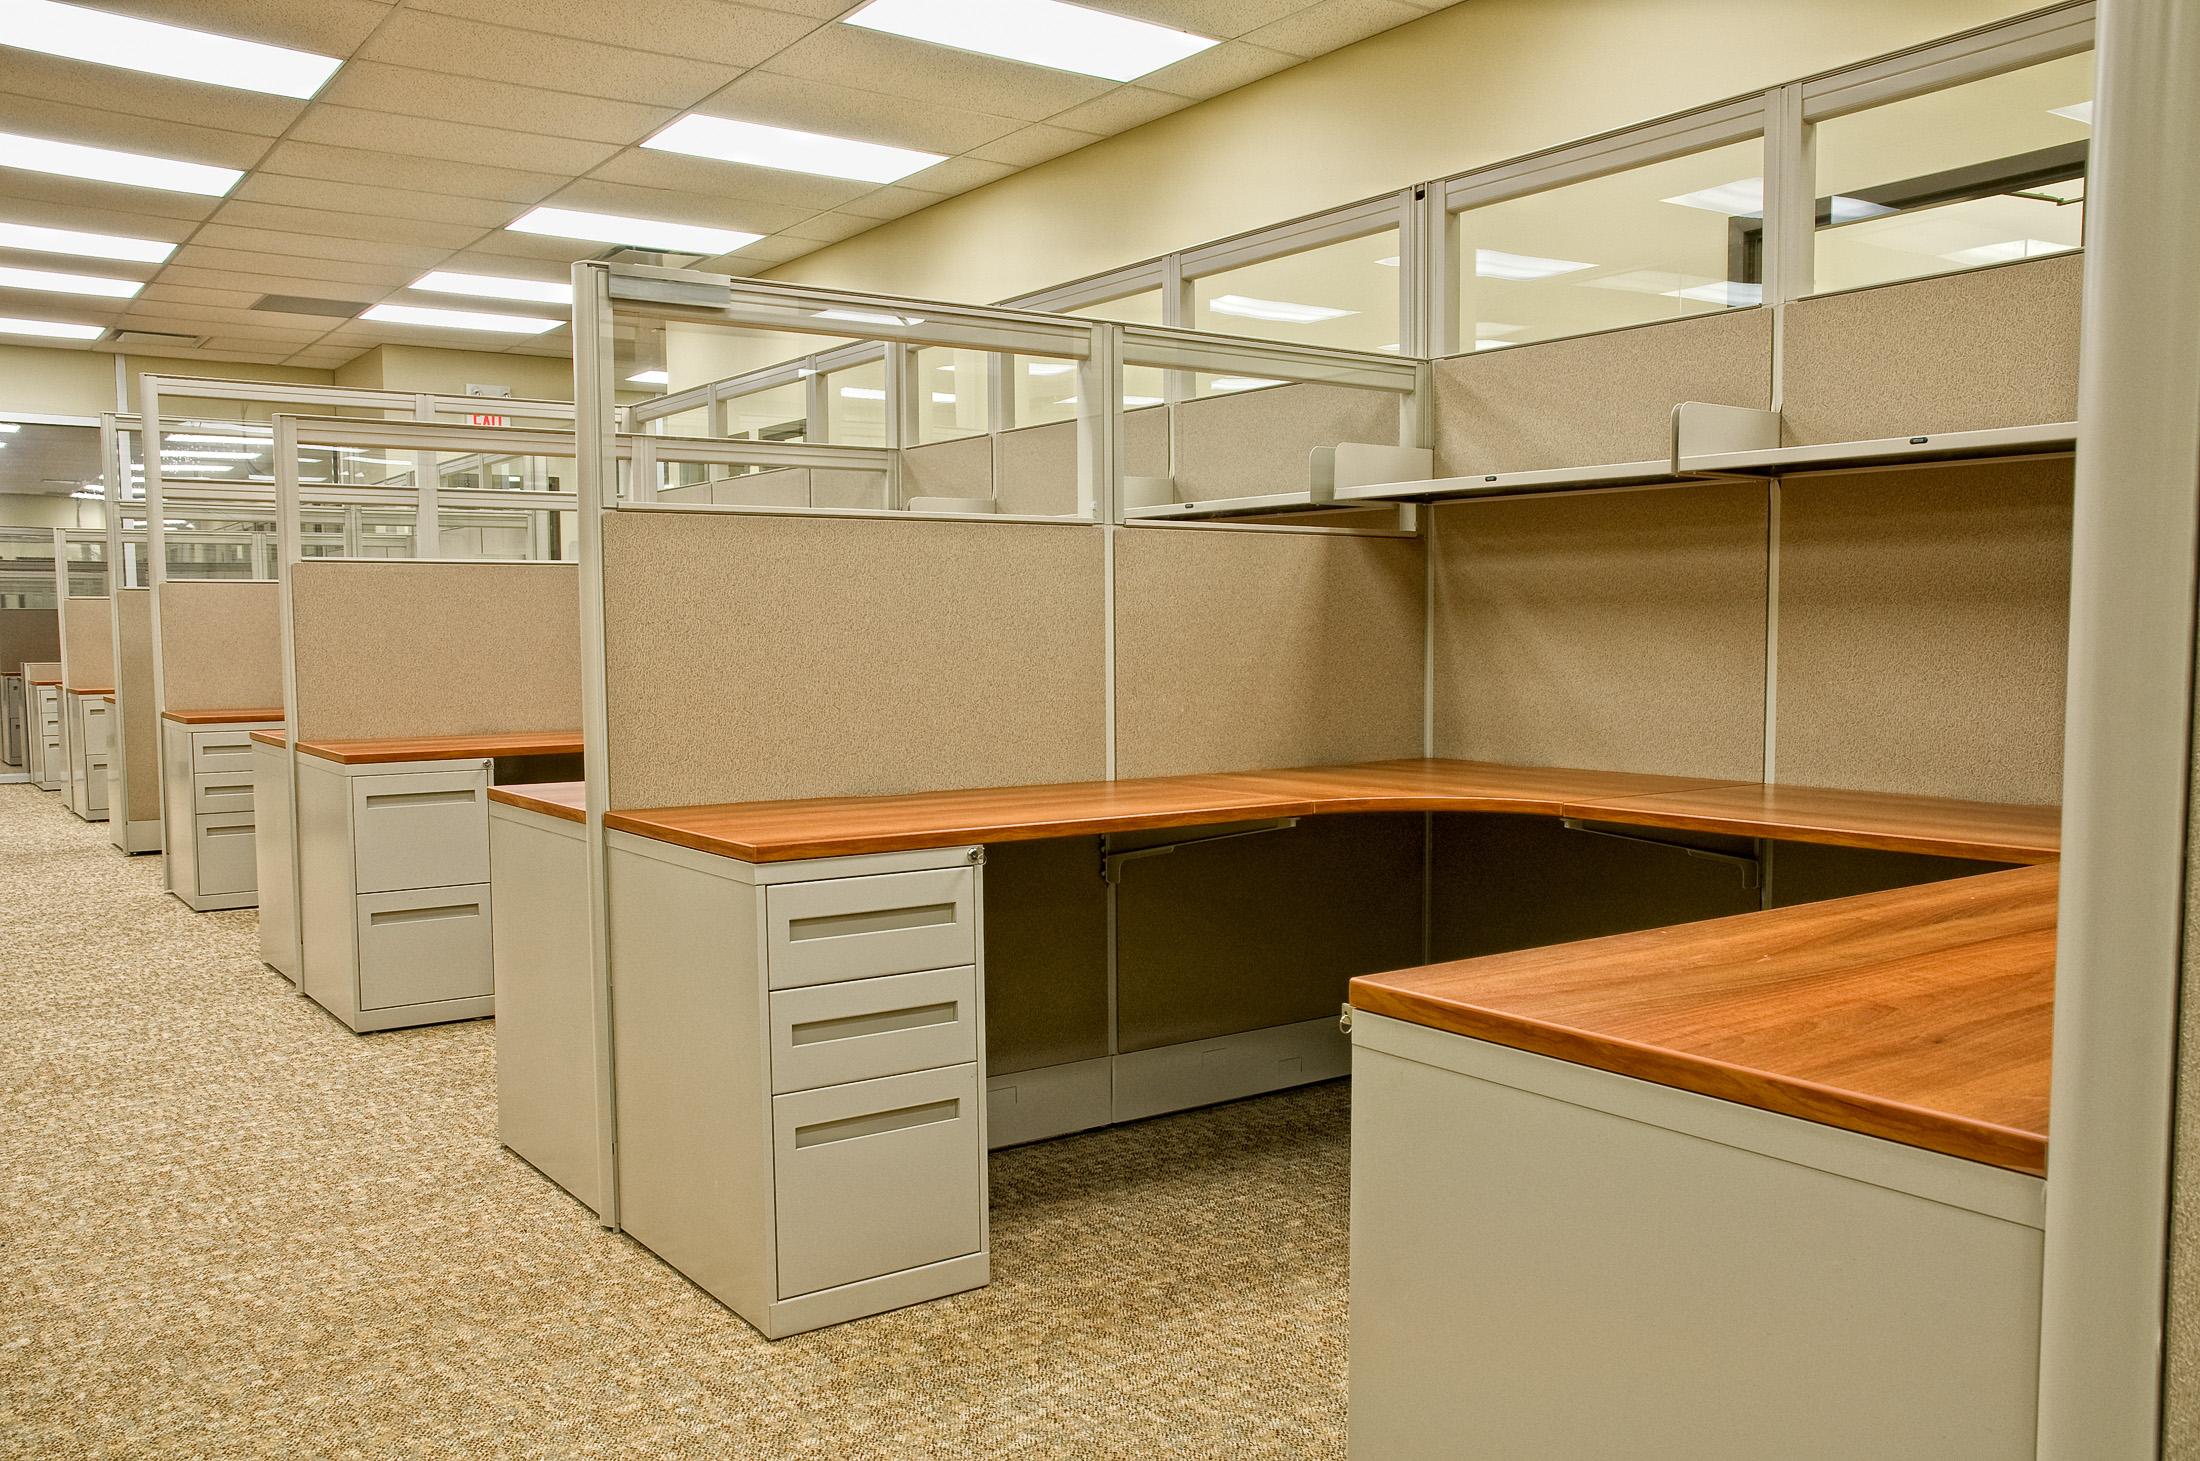 drywall mudding new office hallway meeting room hallway office space 2200x1461